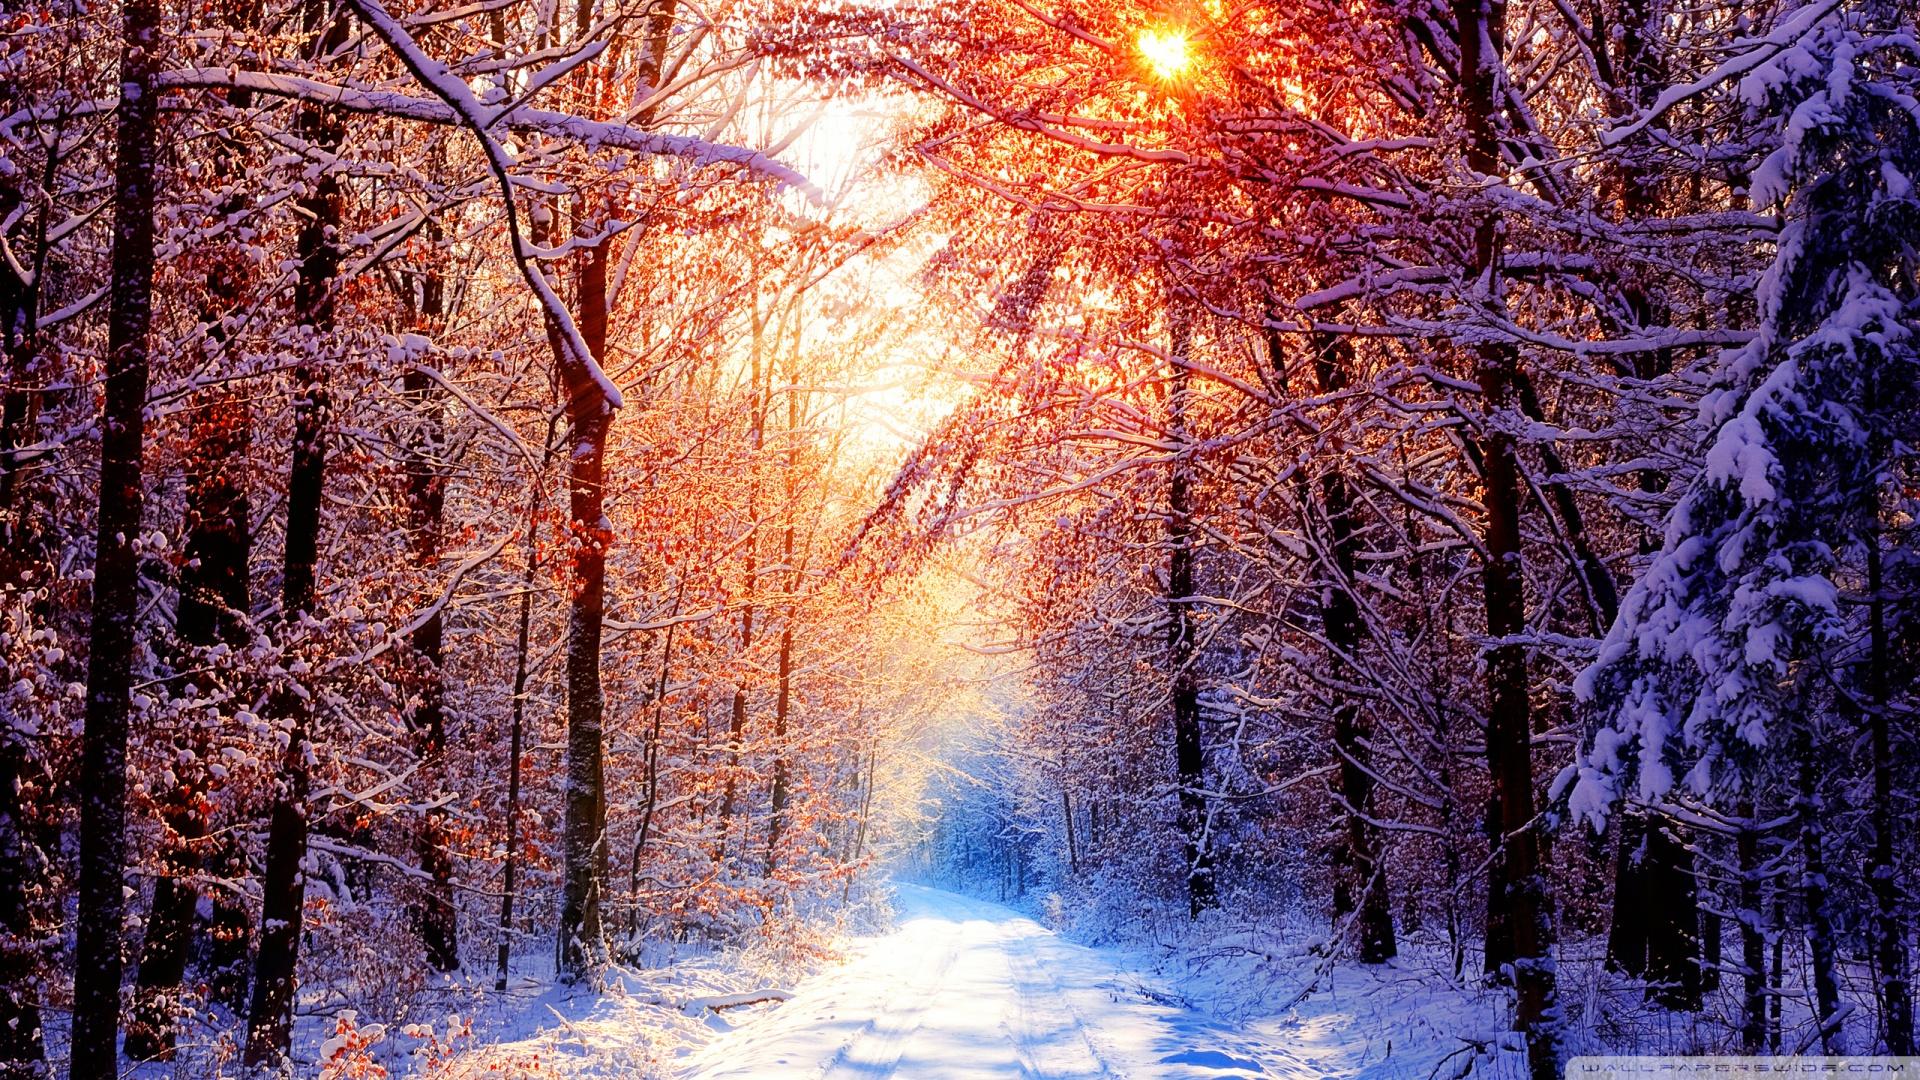 Winter Scenes HD desktop wallpaper Widescreen High Definition 1920x1080